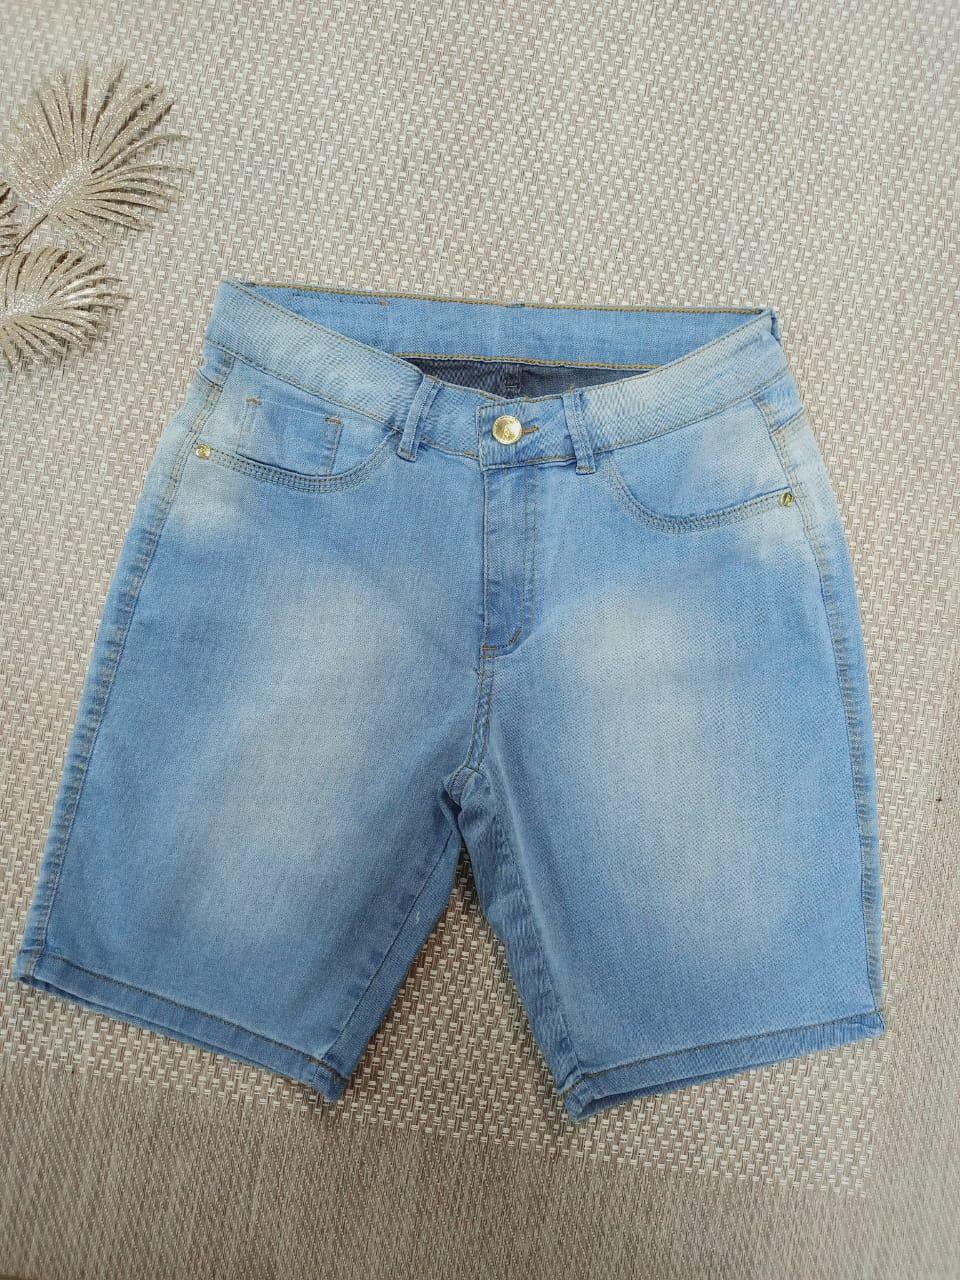 Bermuda Jeans - Mary